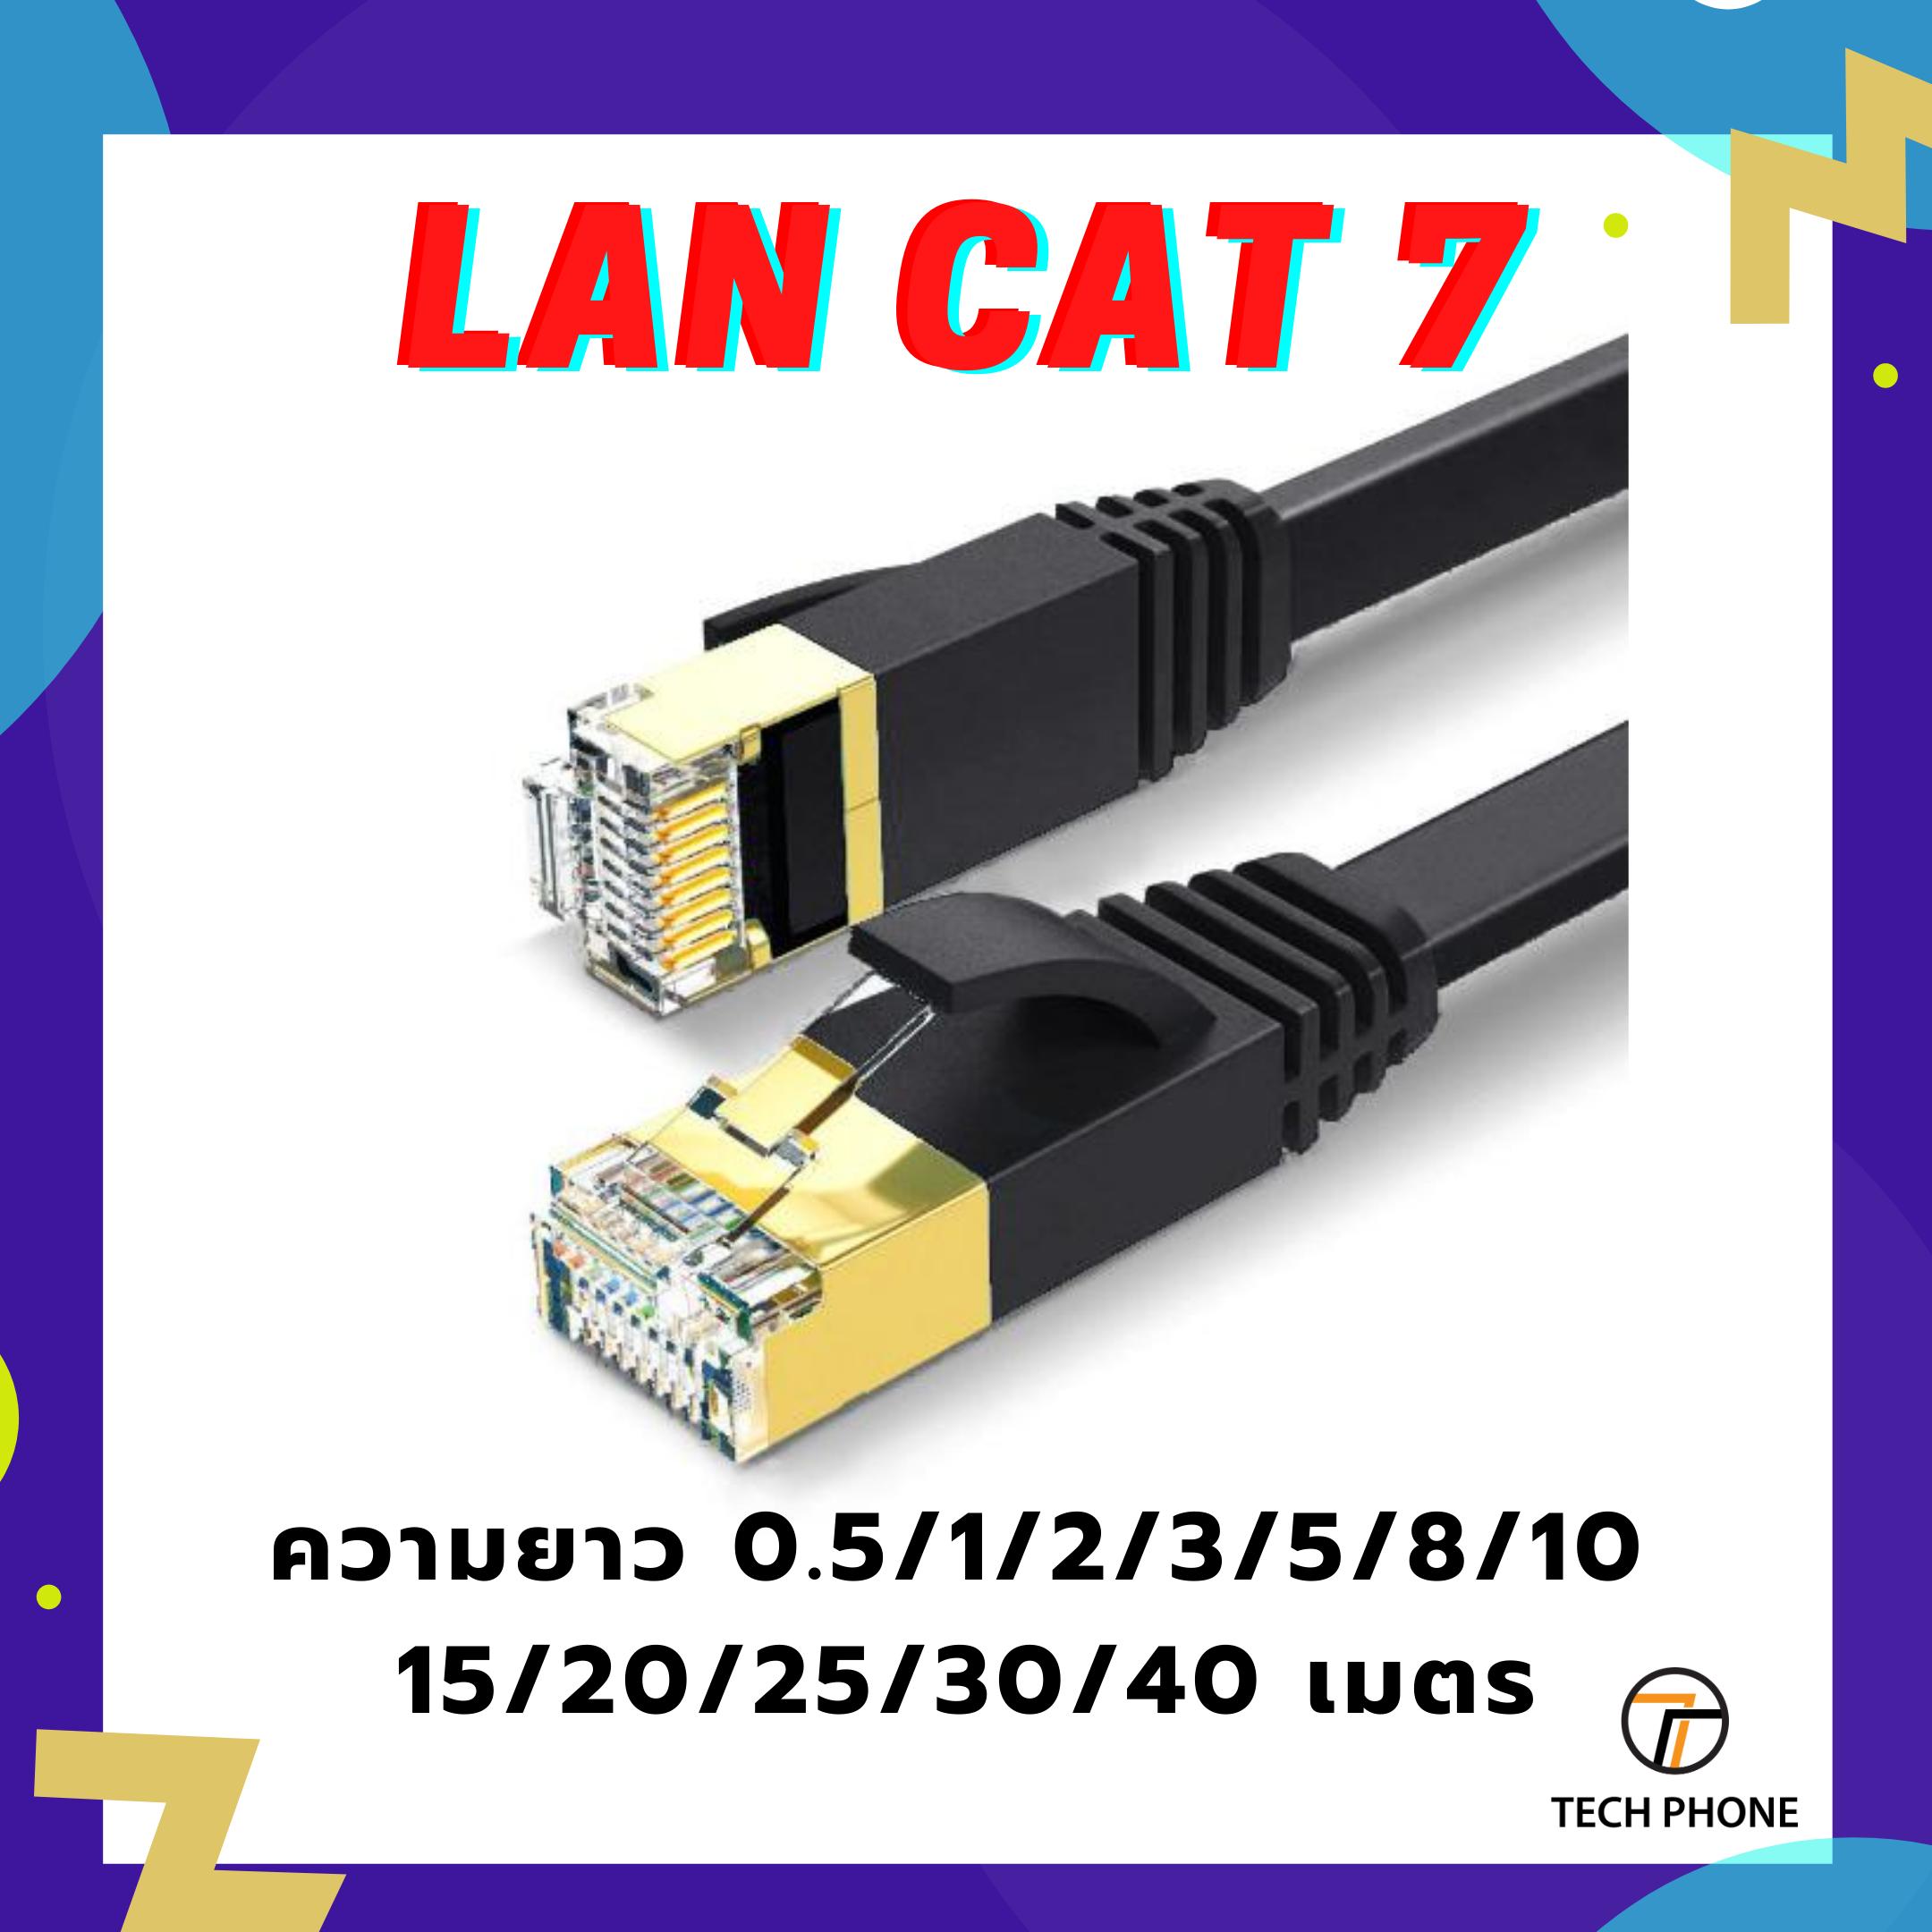 GGL สายแลน CAT 7 Lan cable 0.5 1 2 3 5 8 10 15 20 25 30 40 50 เมตร เข้าหัวสำเร็จรูป สายแบน สีดำ ลดการรบกวน CAT 7 LAN cable Ethernet Cable 10G Transmission 600MHZ High Speed Network